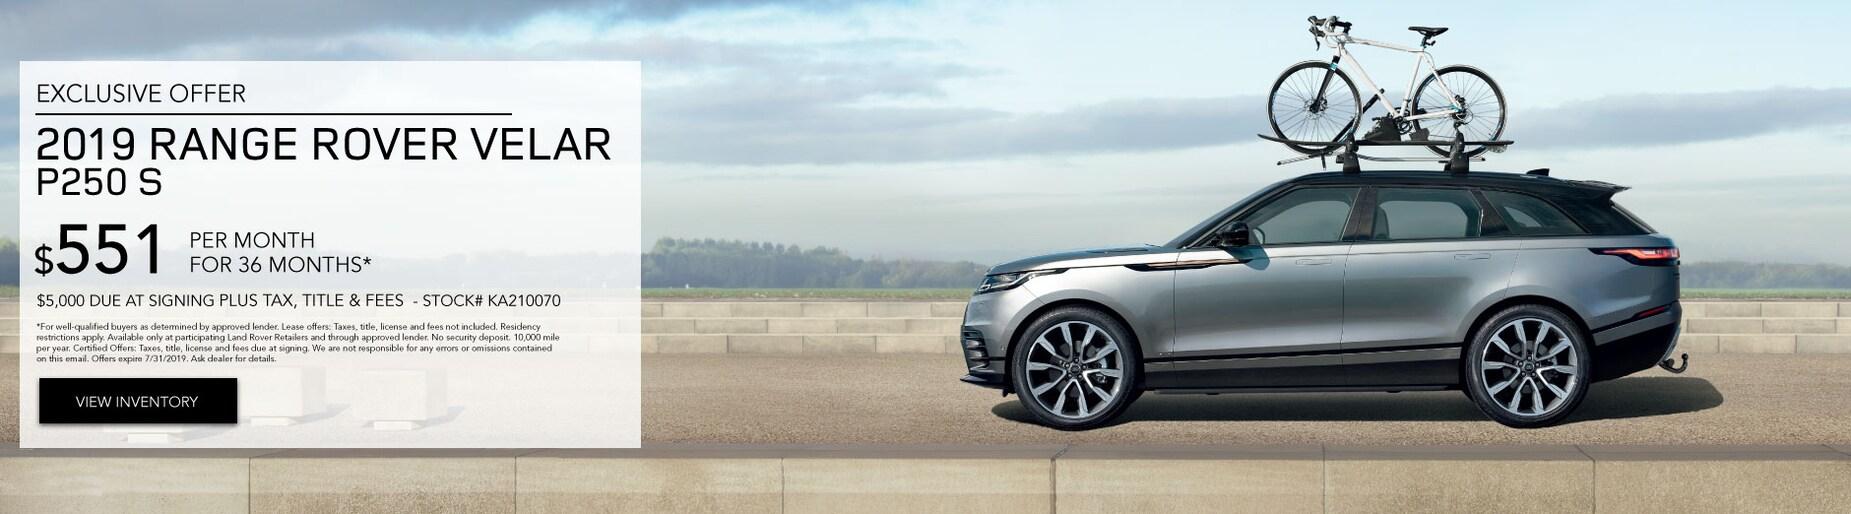 Land Rover Dealership >> Land Rover North Atlanta Land Rover Dealership In Alpharetta Near